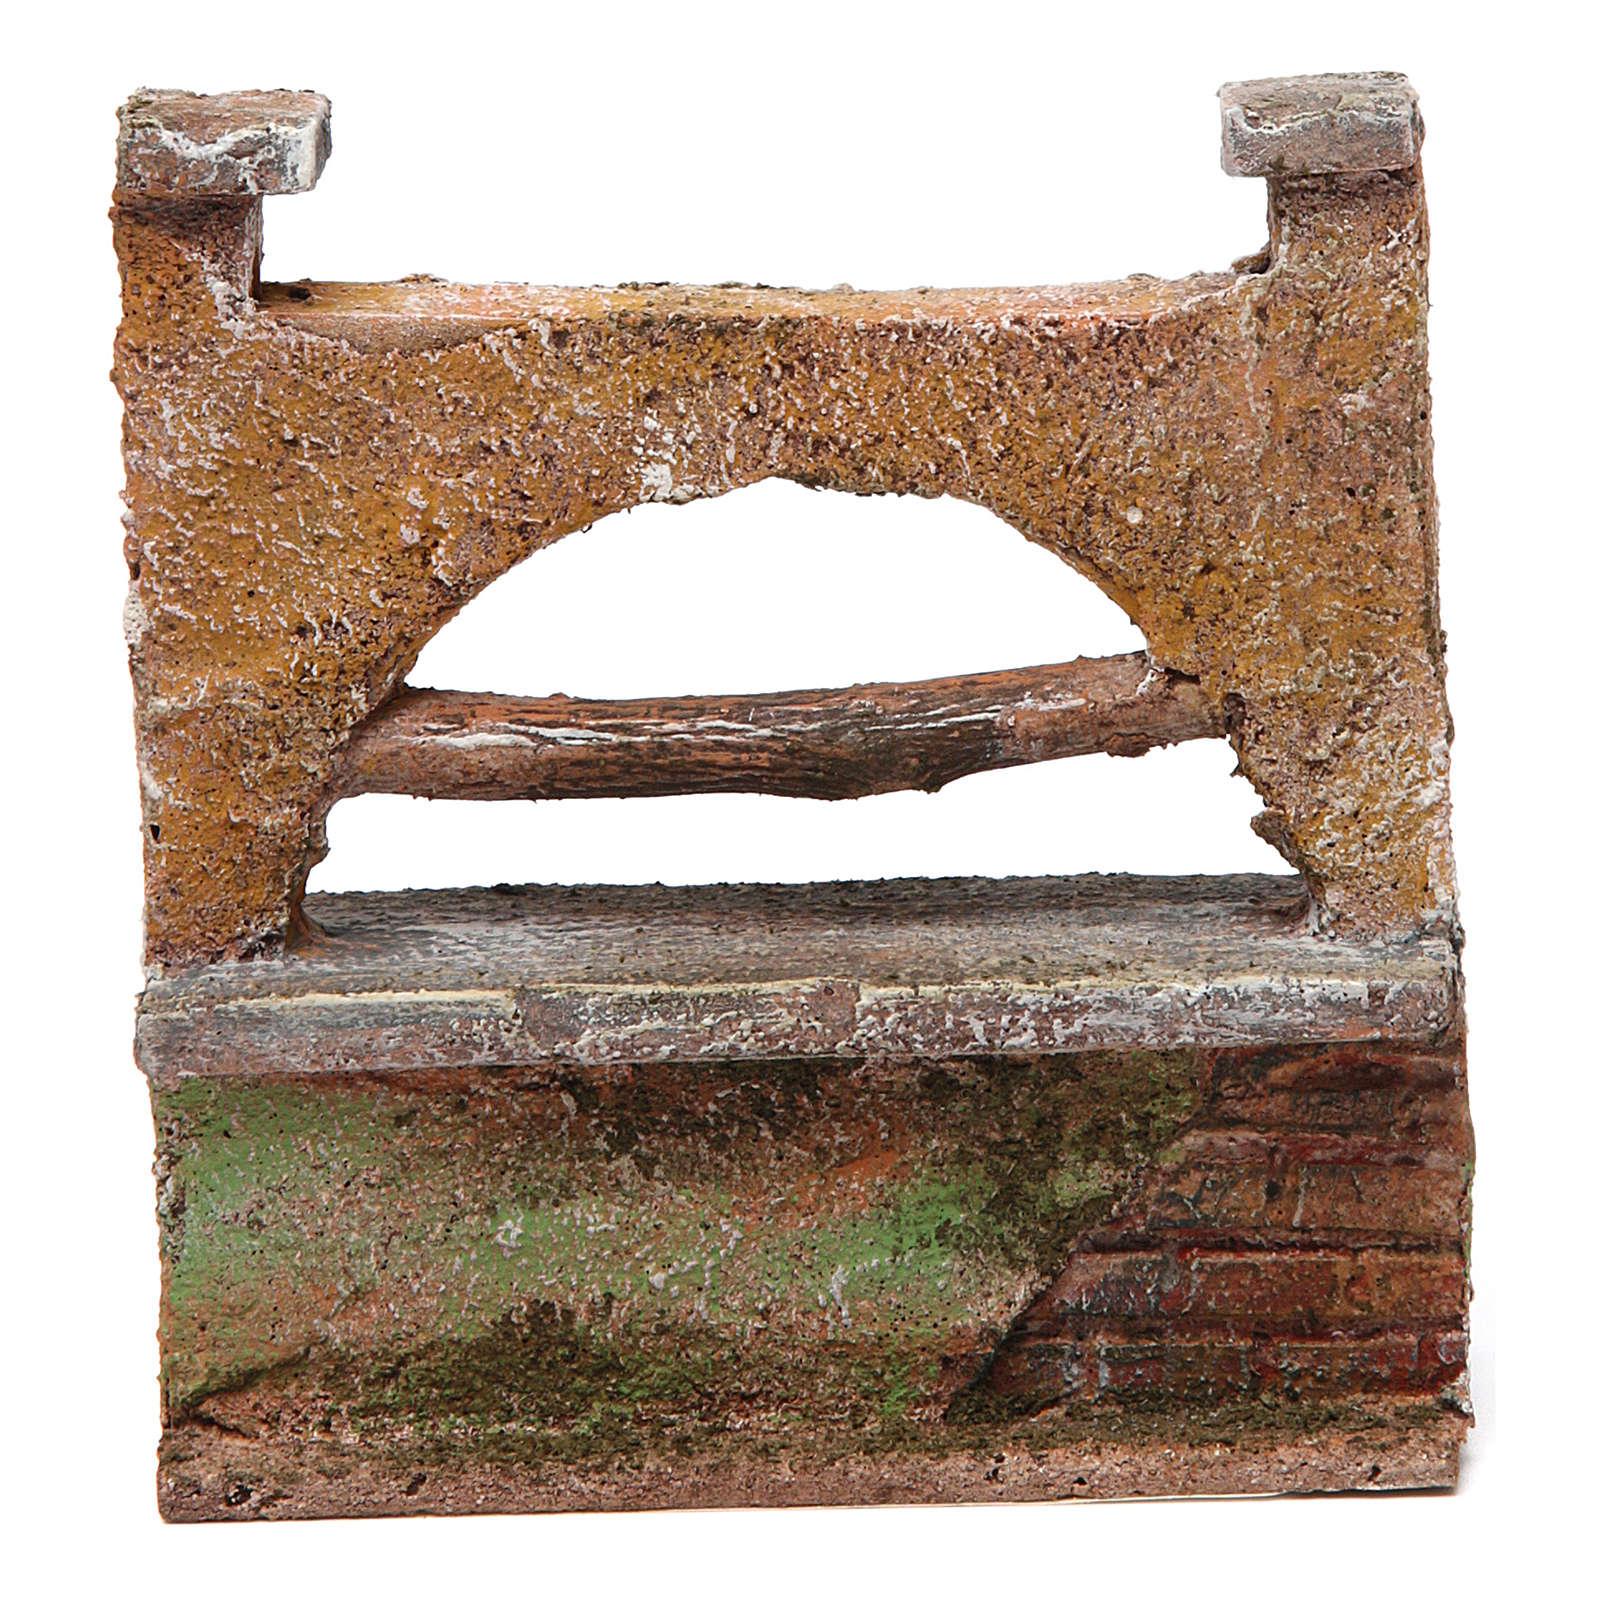 Muretto arco per presepe 10 cm 10x5x10 cm 4